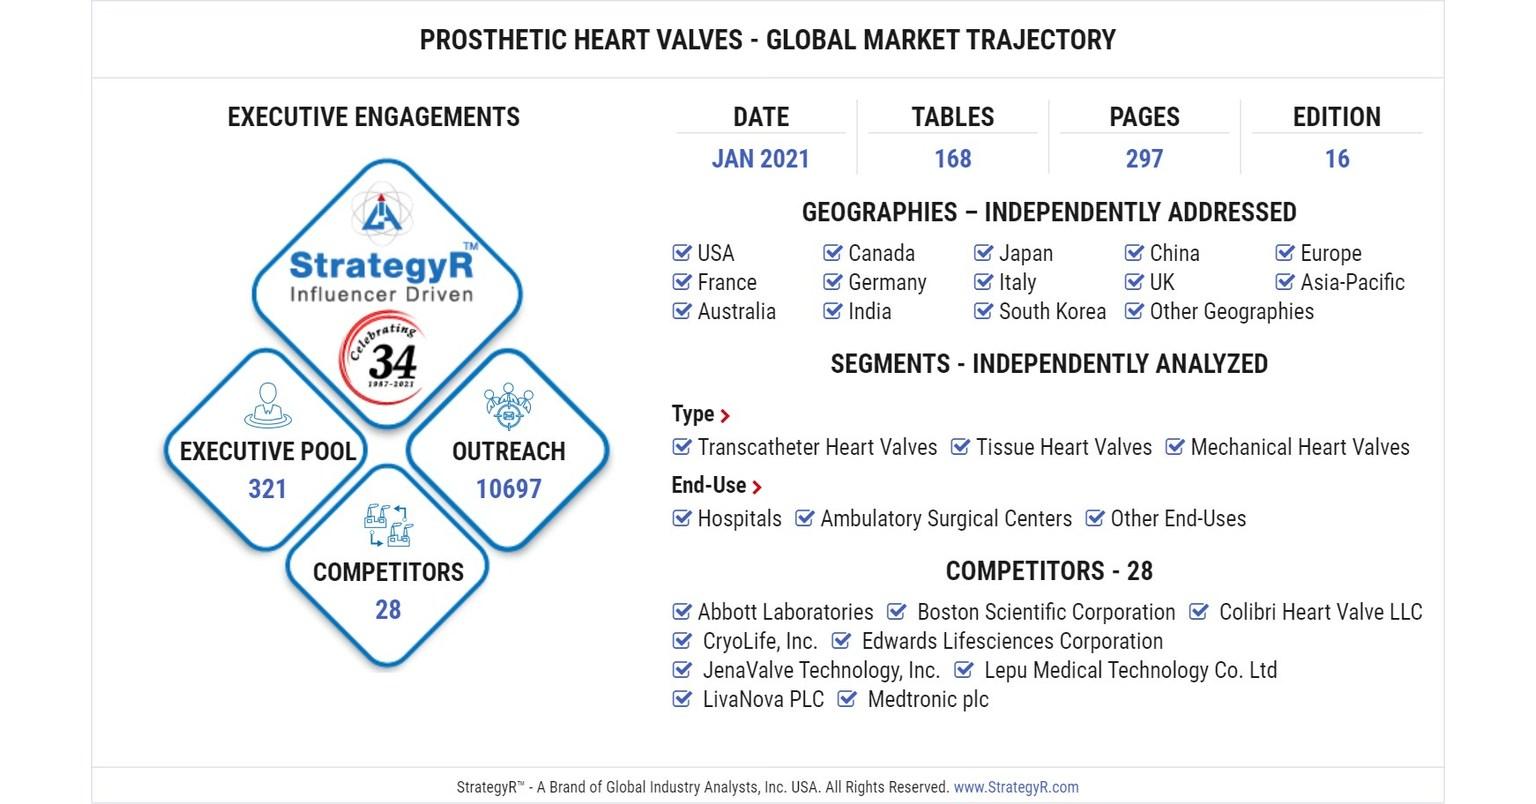 Global Prosthetic Heart Valves Market to Reach $20.20 Billion by 20